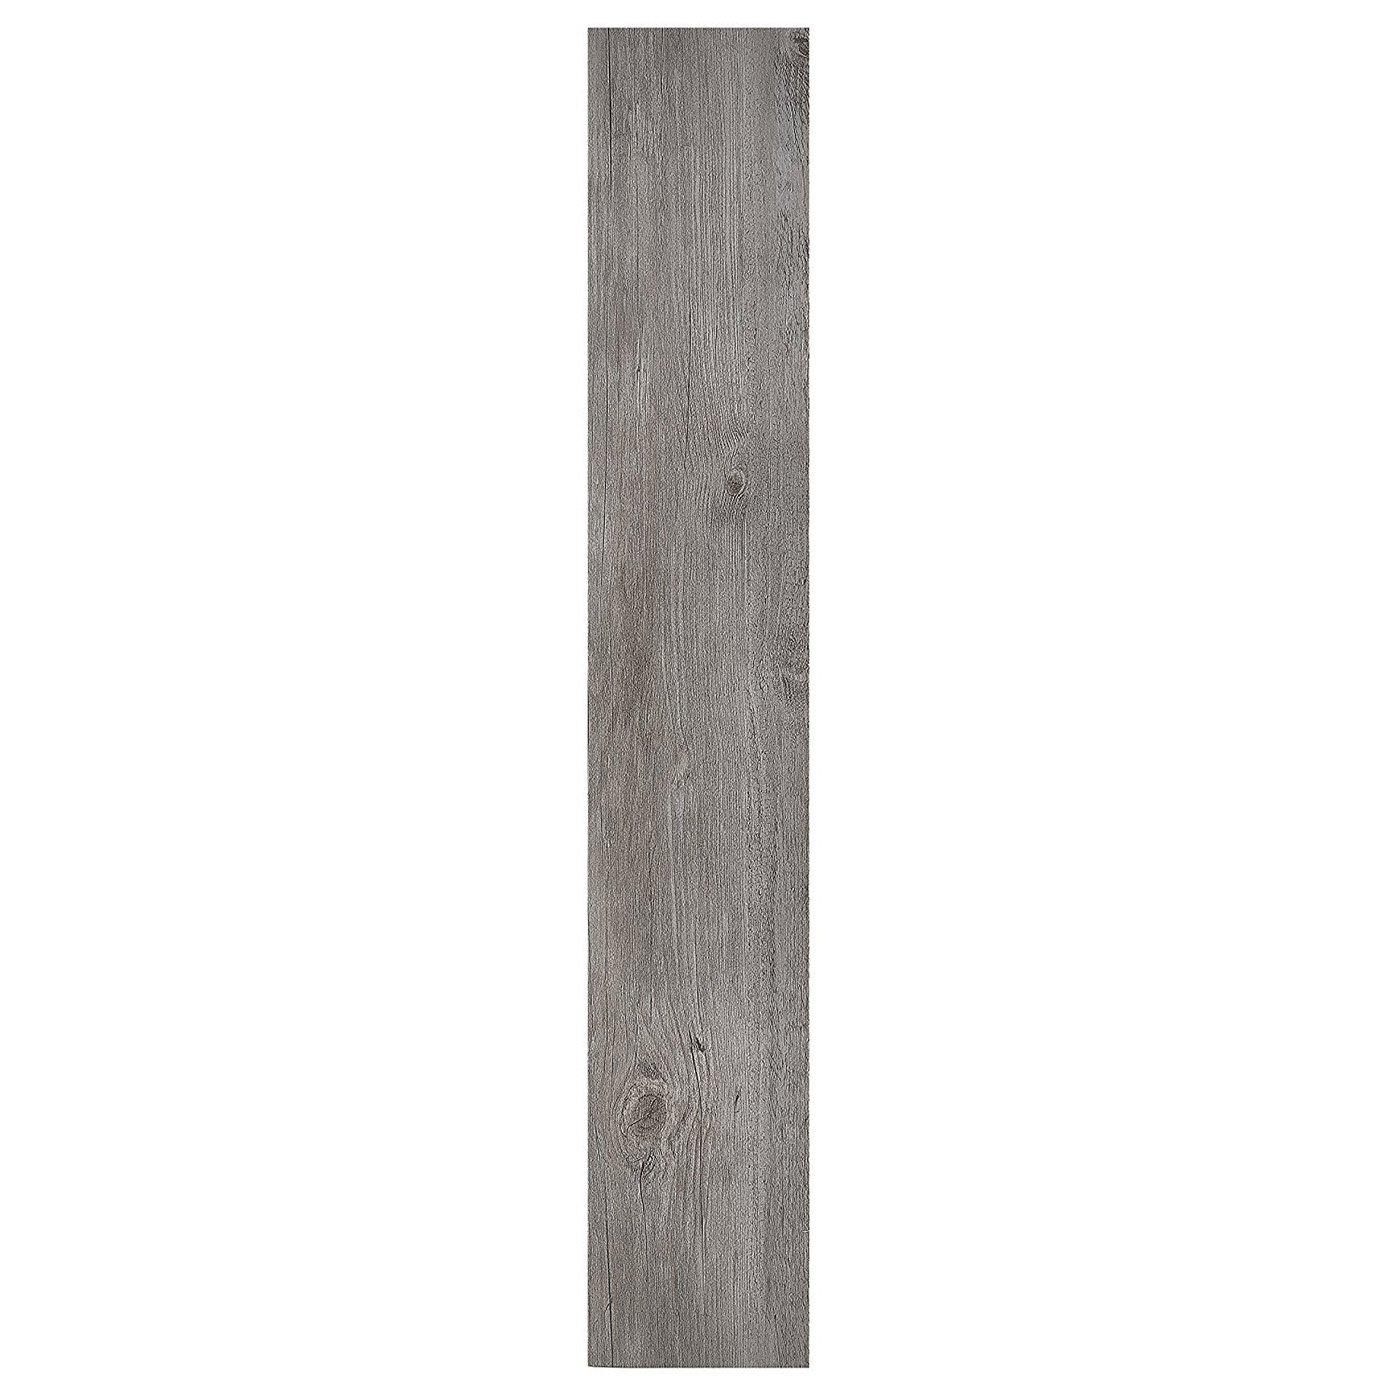 Achim Home Furnishings VFP1.2GO60 Achim Home Imports Nexus Light Grey Oak 6x36 Self Adhesive Vinyl Floor Planks Planks/90 Sq Ft, 60 Pack